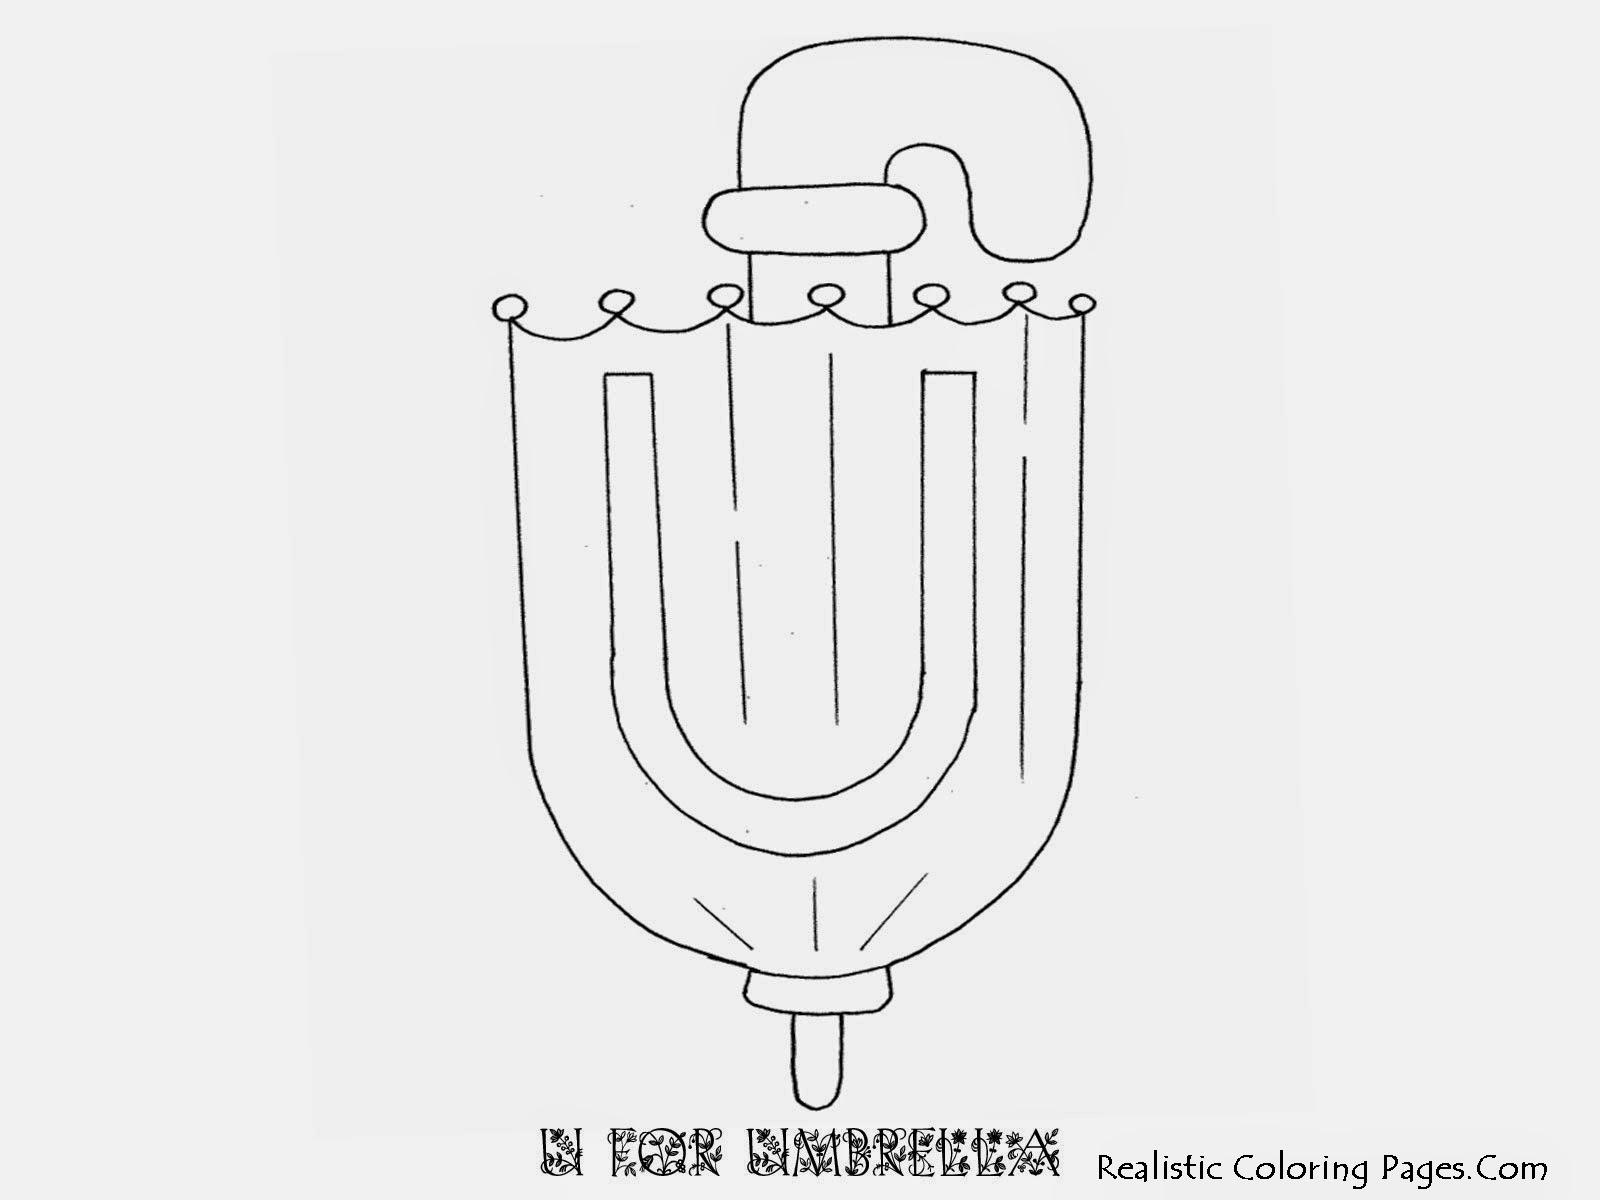 Alphabet Coloring Pages U FOR UMBRELLA